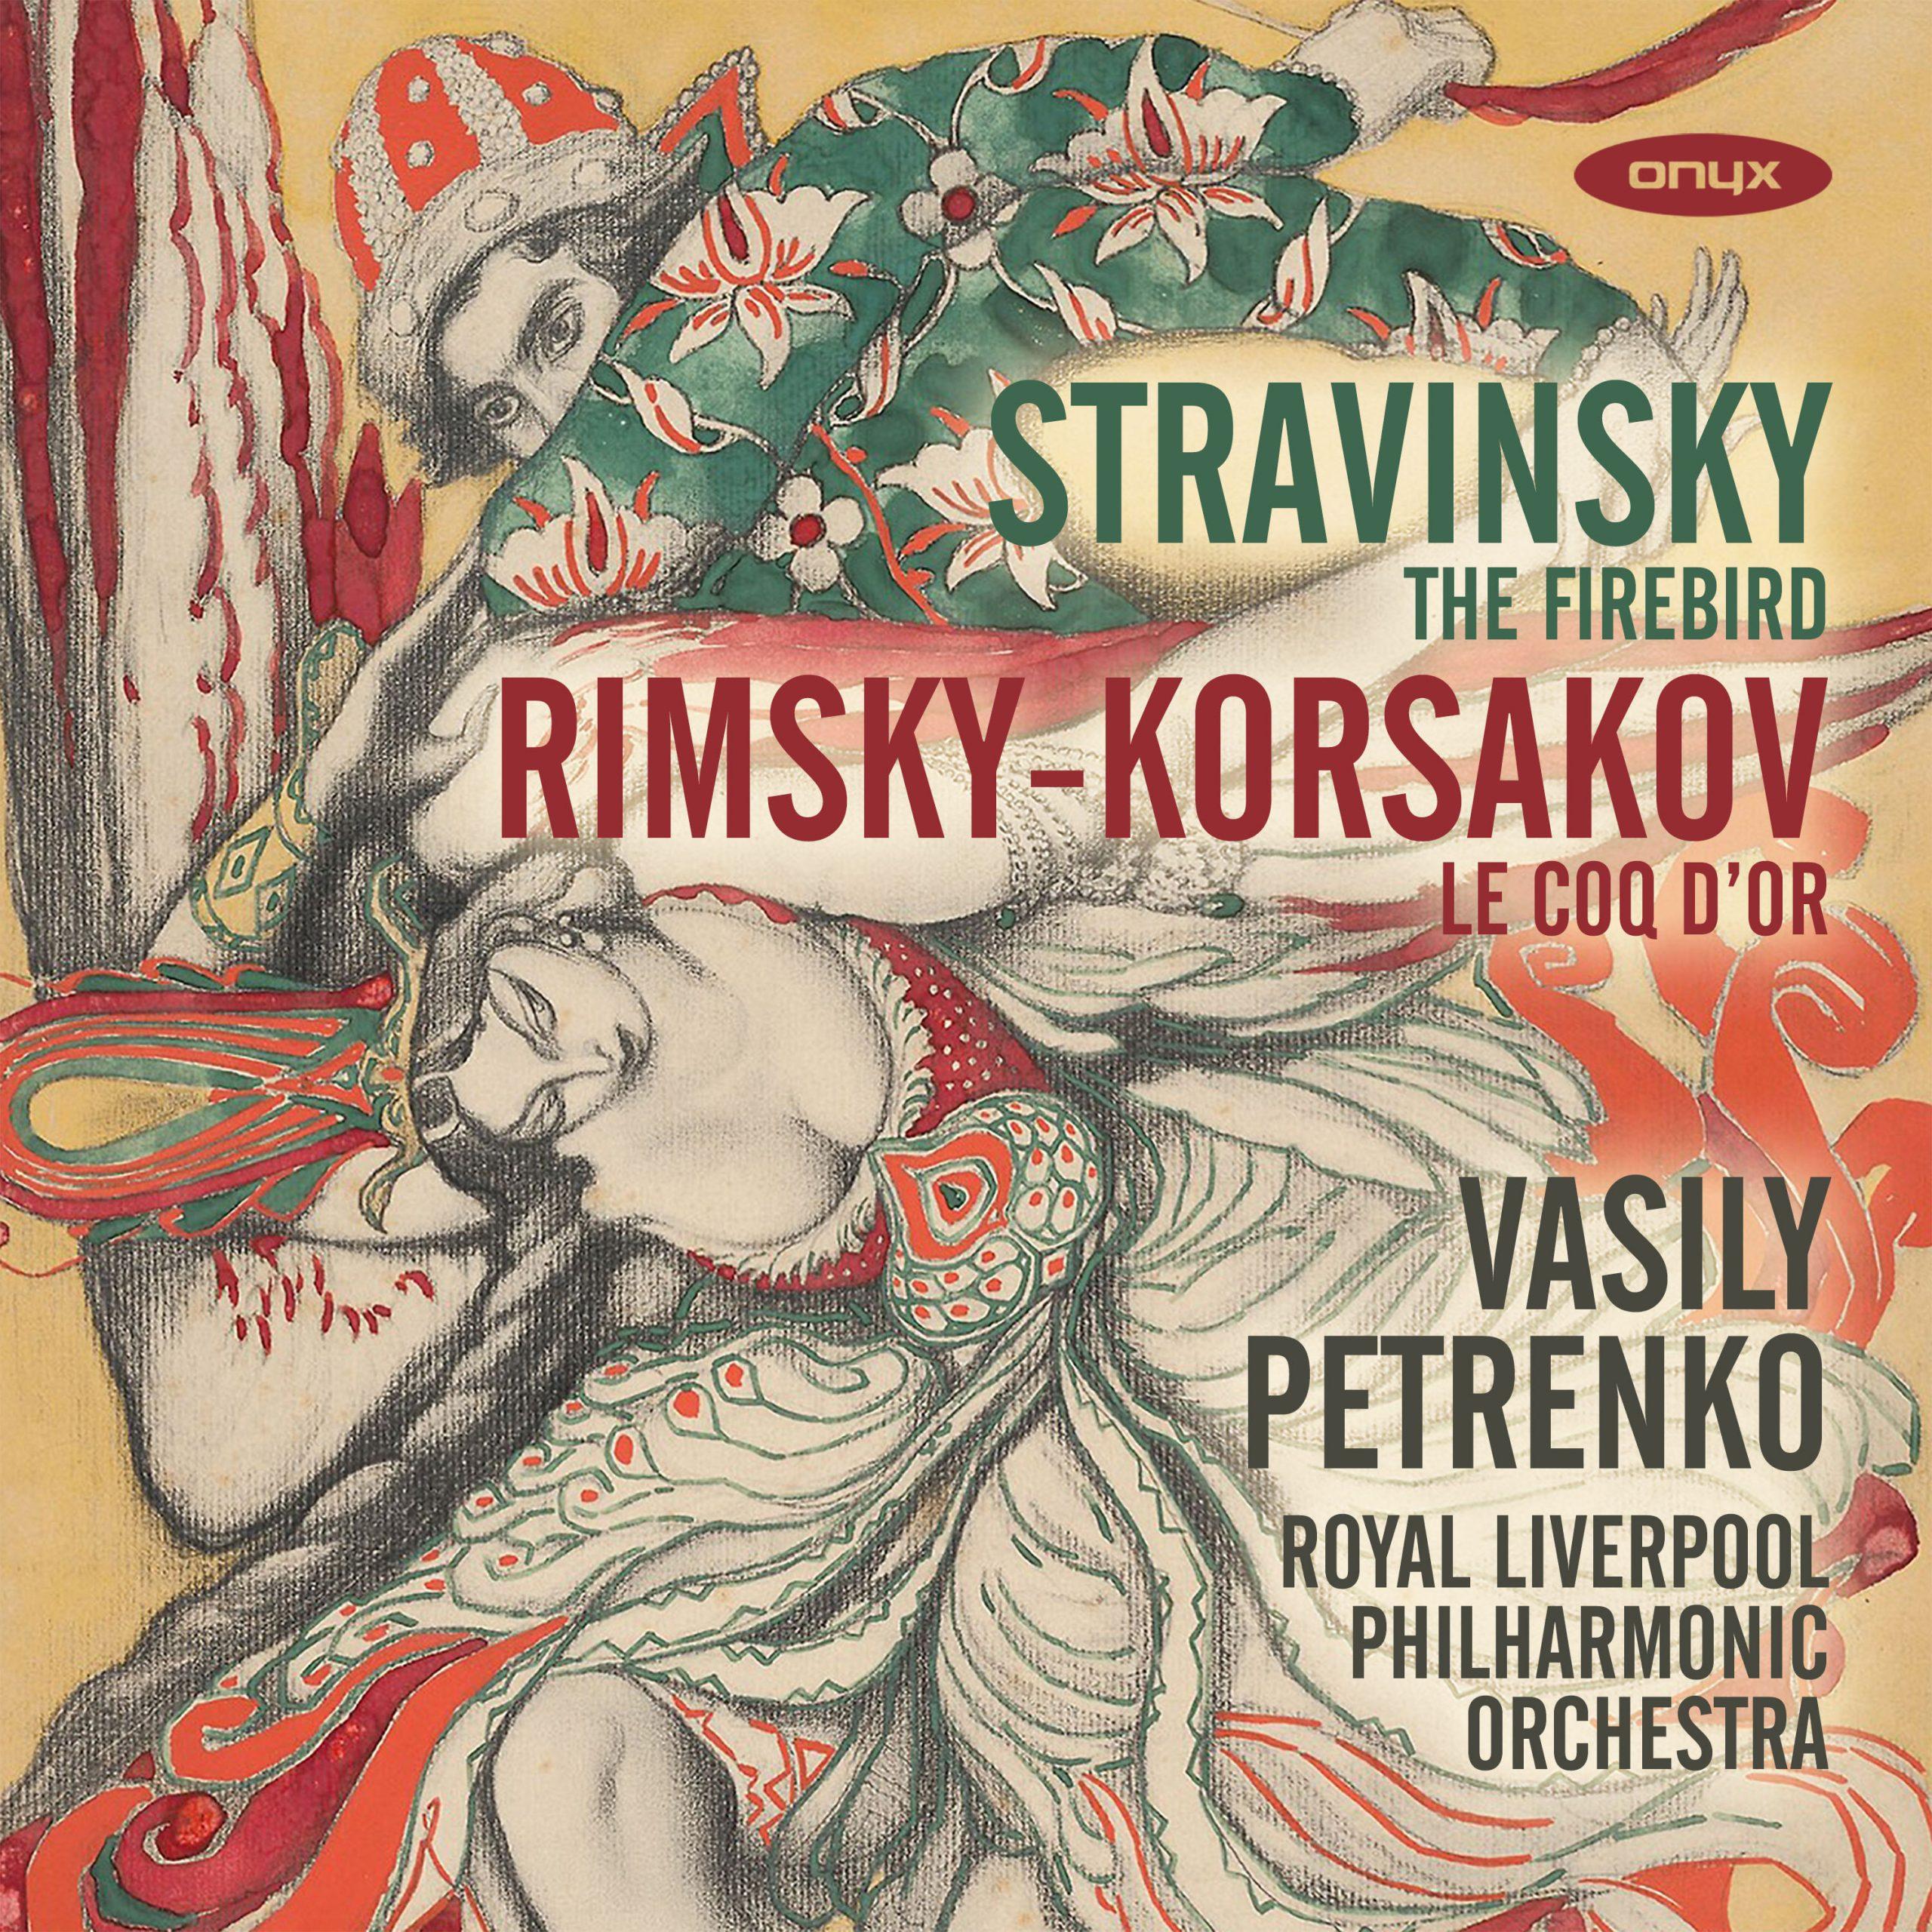 Stravinsky: L'Oiseau de feu / Rimsky-Korsakov: Le Coq d'or